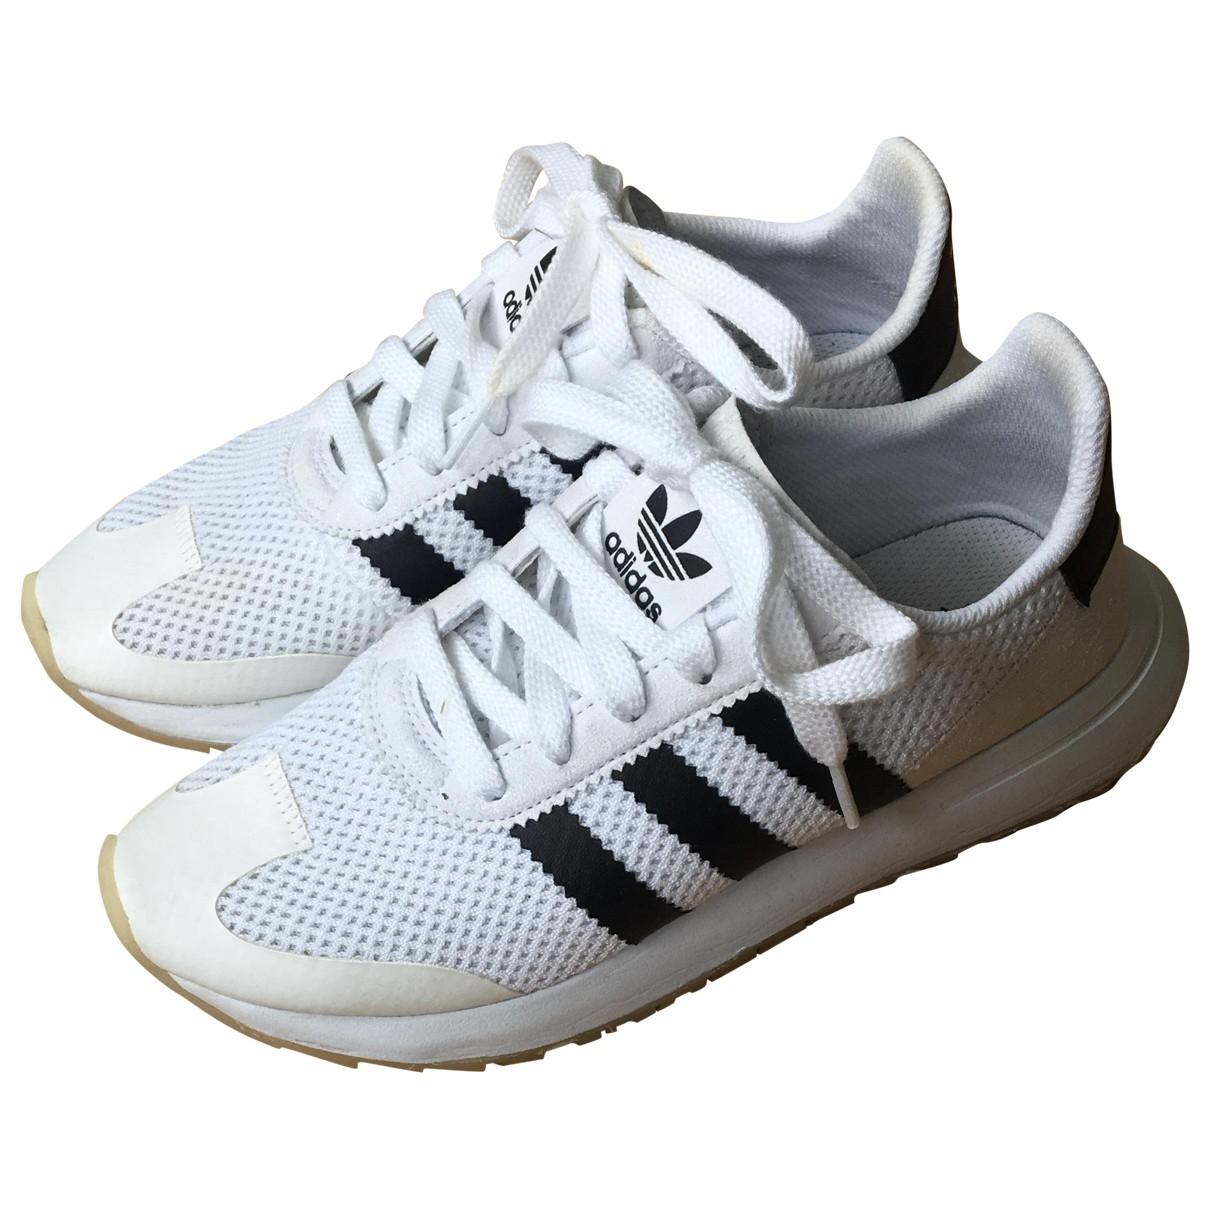 Adidas \N White Cloth Trainers for Women 38 EU